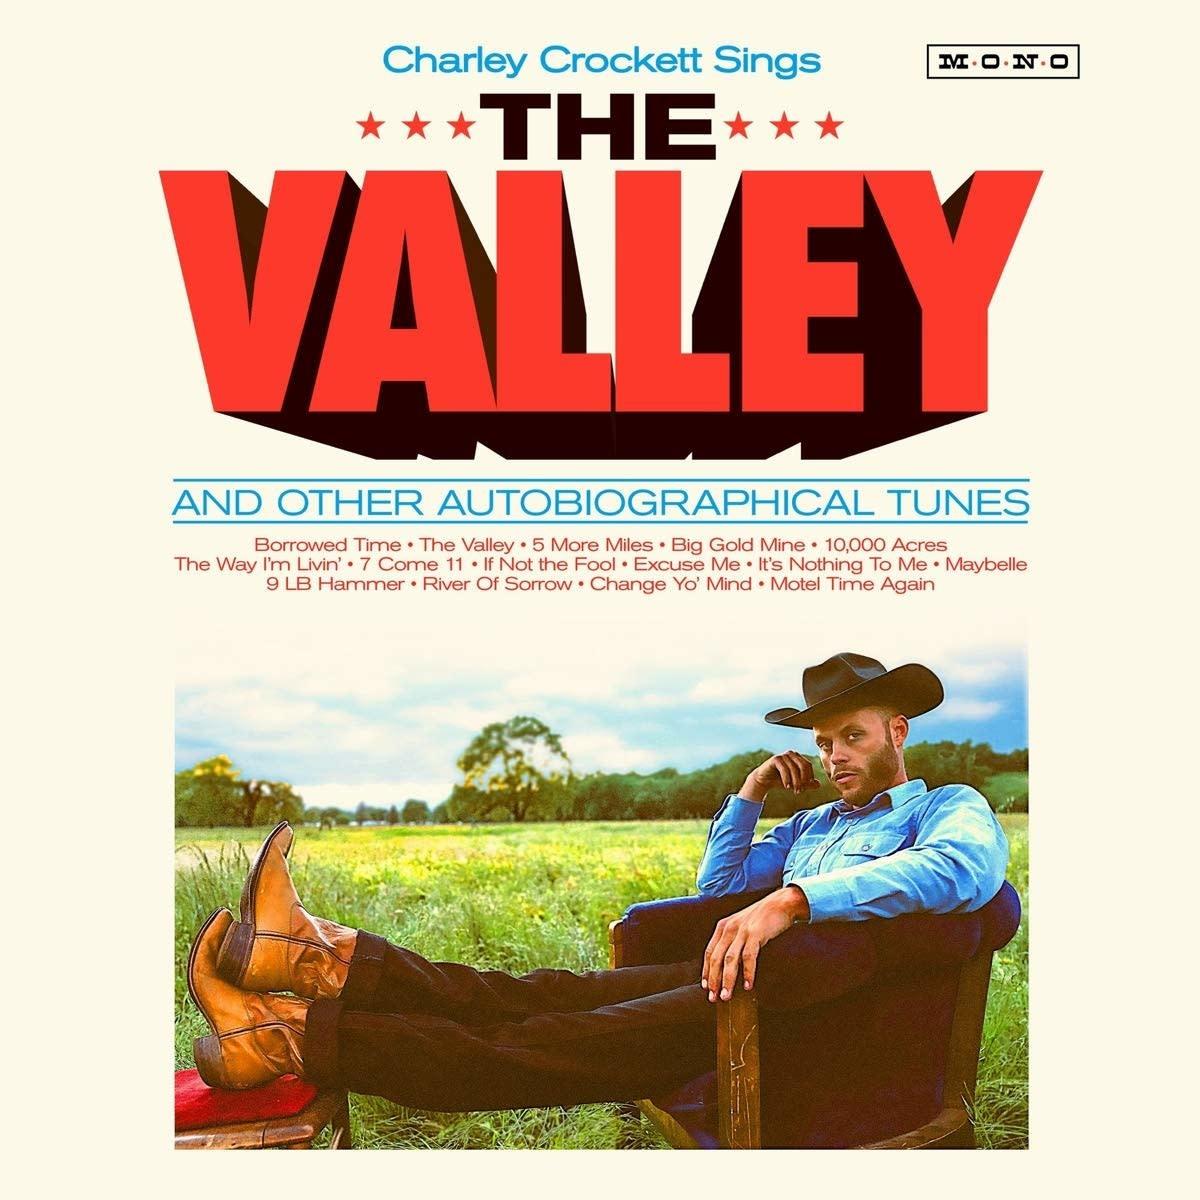 Charley Crockett – The Valley